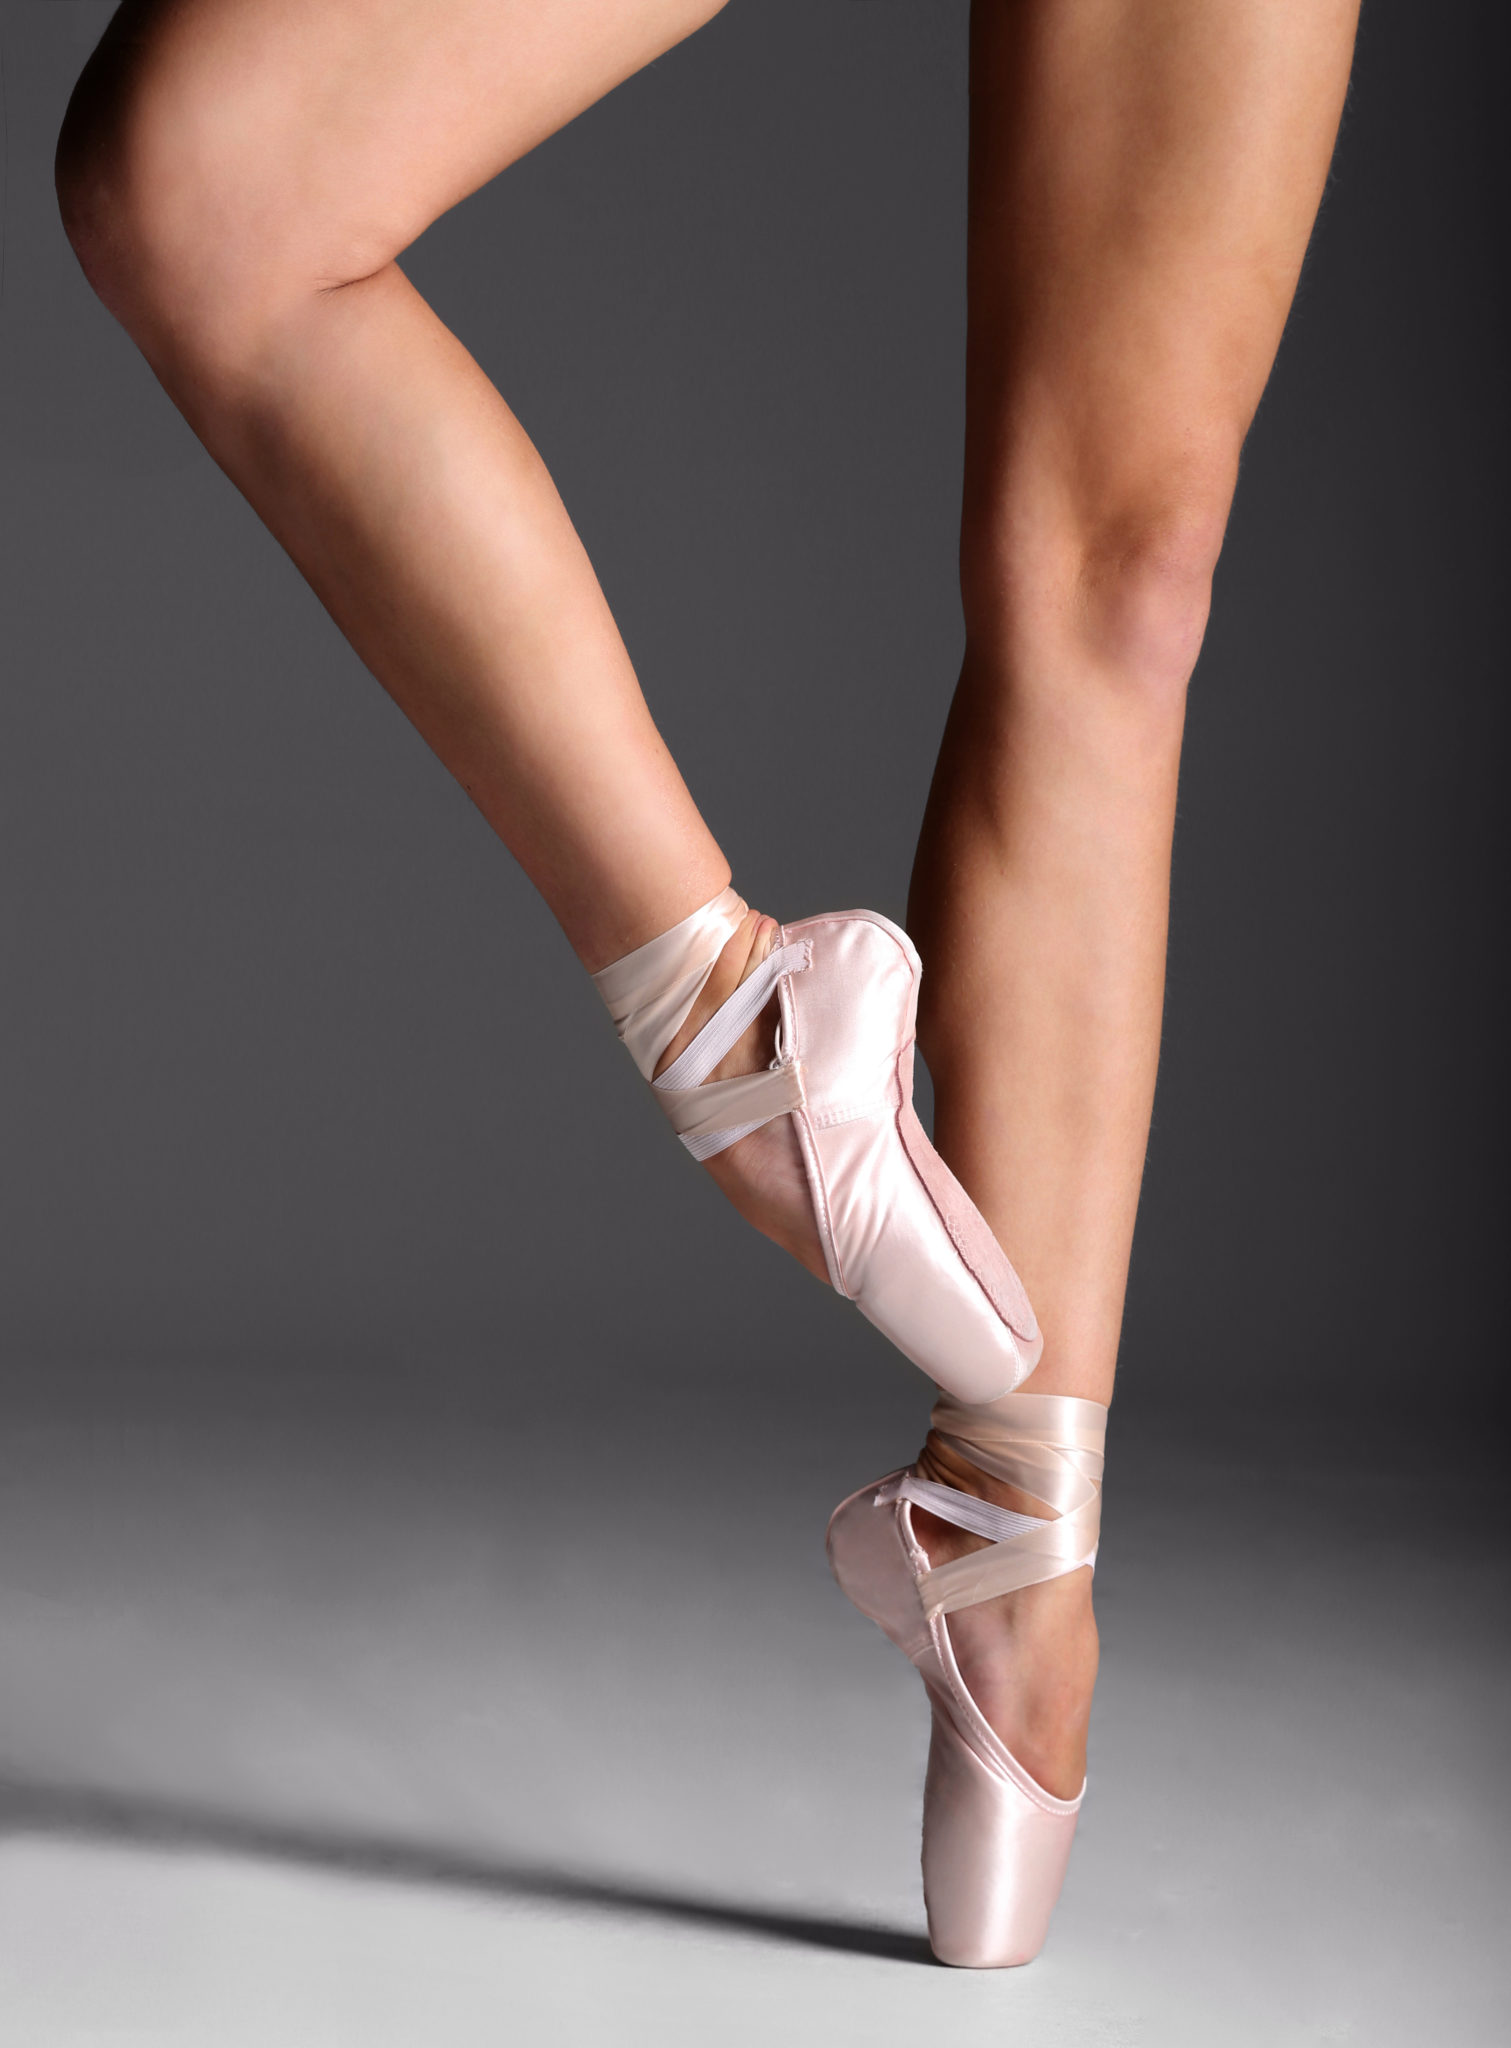 35f198264c Sapatilha de Ponta Pirouette - Evidence Ballet - Loja Virtual